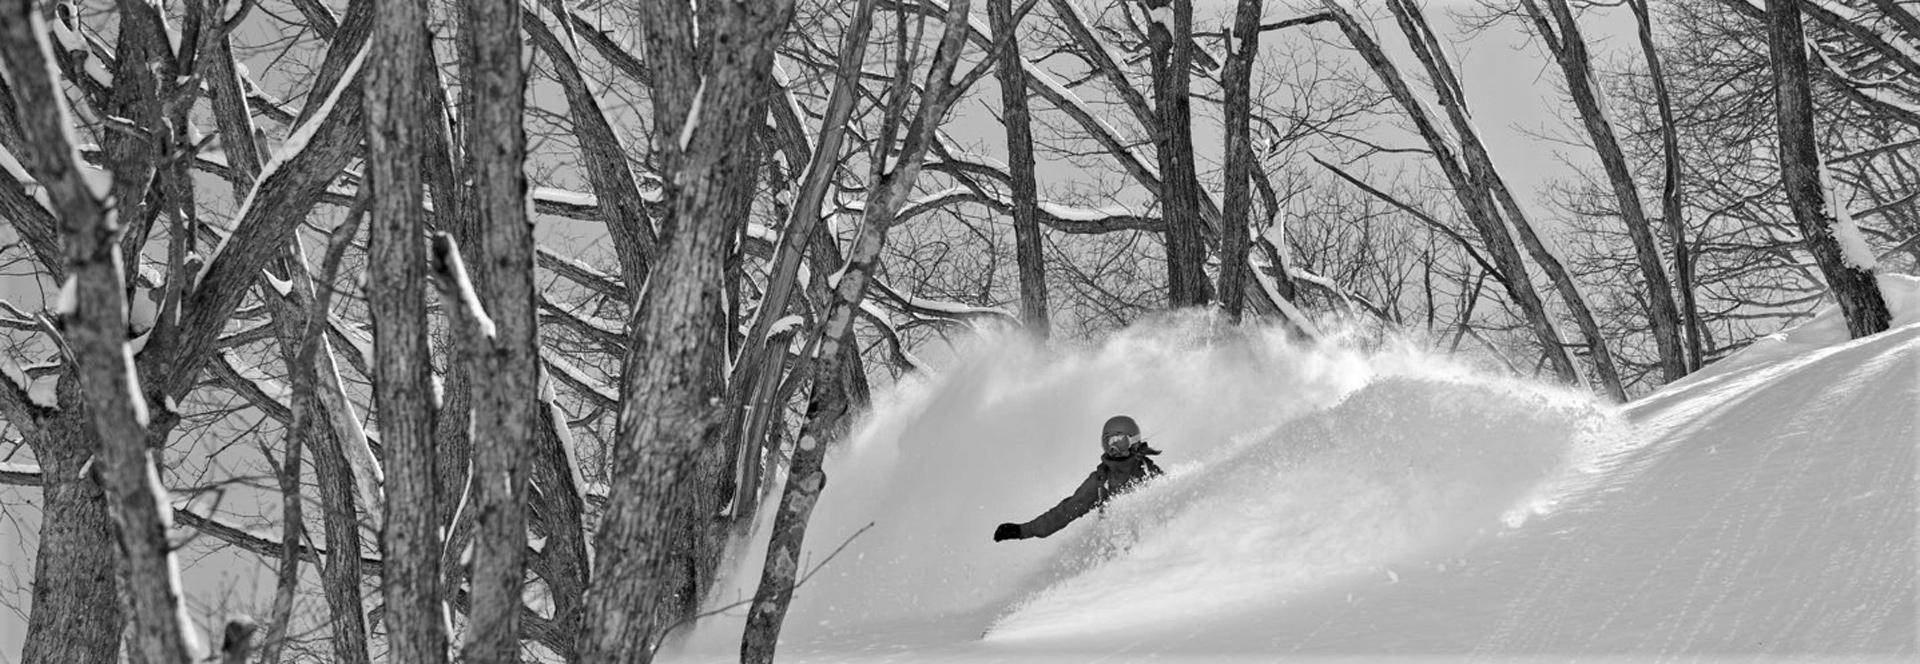 Ski & Snowboard dans la neige poudreuse - Kodama Lodge - Japon